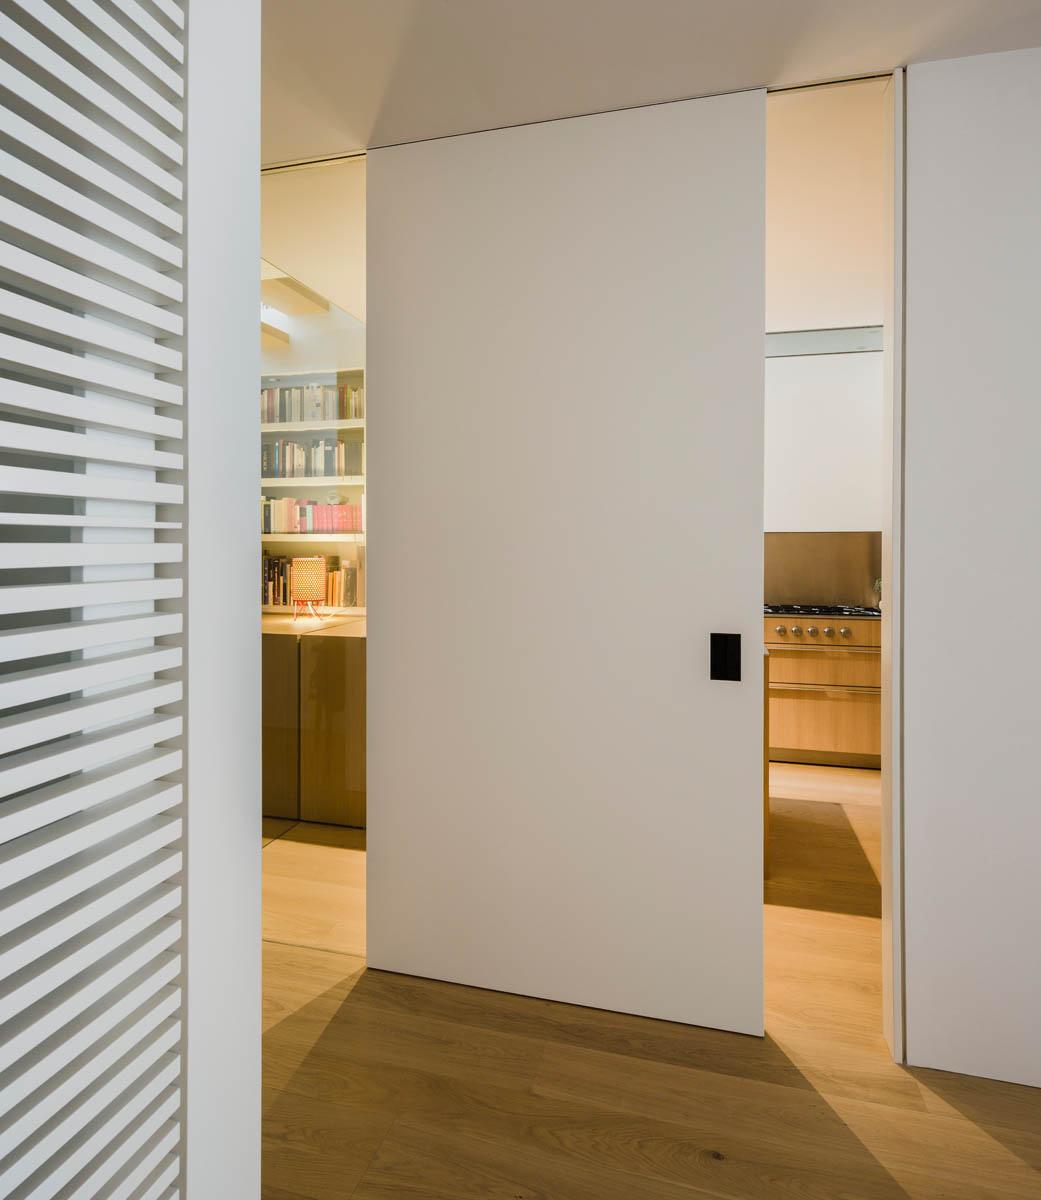 Barcelona Small Apartments: RA Apartment In Barcelona By Francesc Rife Studio